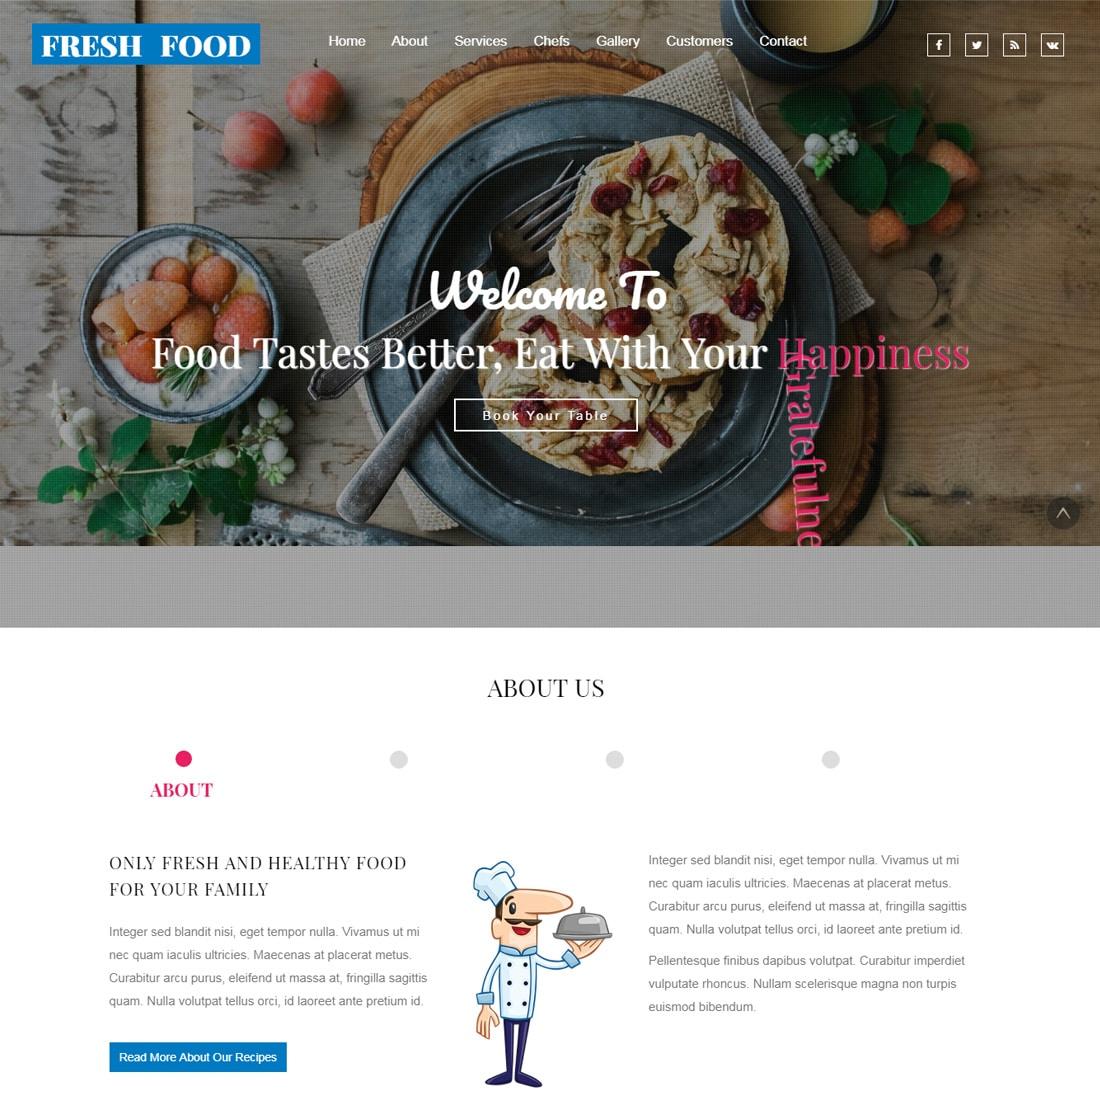 20 Best Ever Free Restaurant Website Templates Of 2018